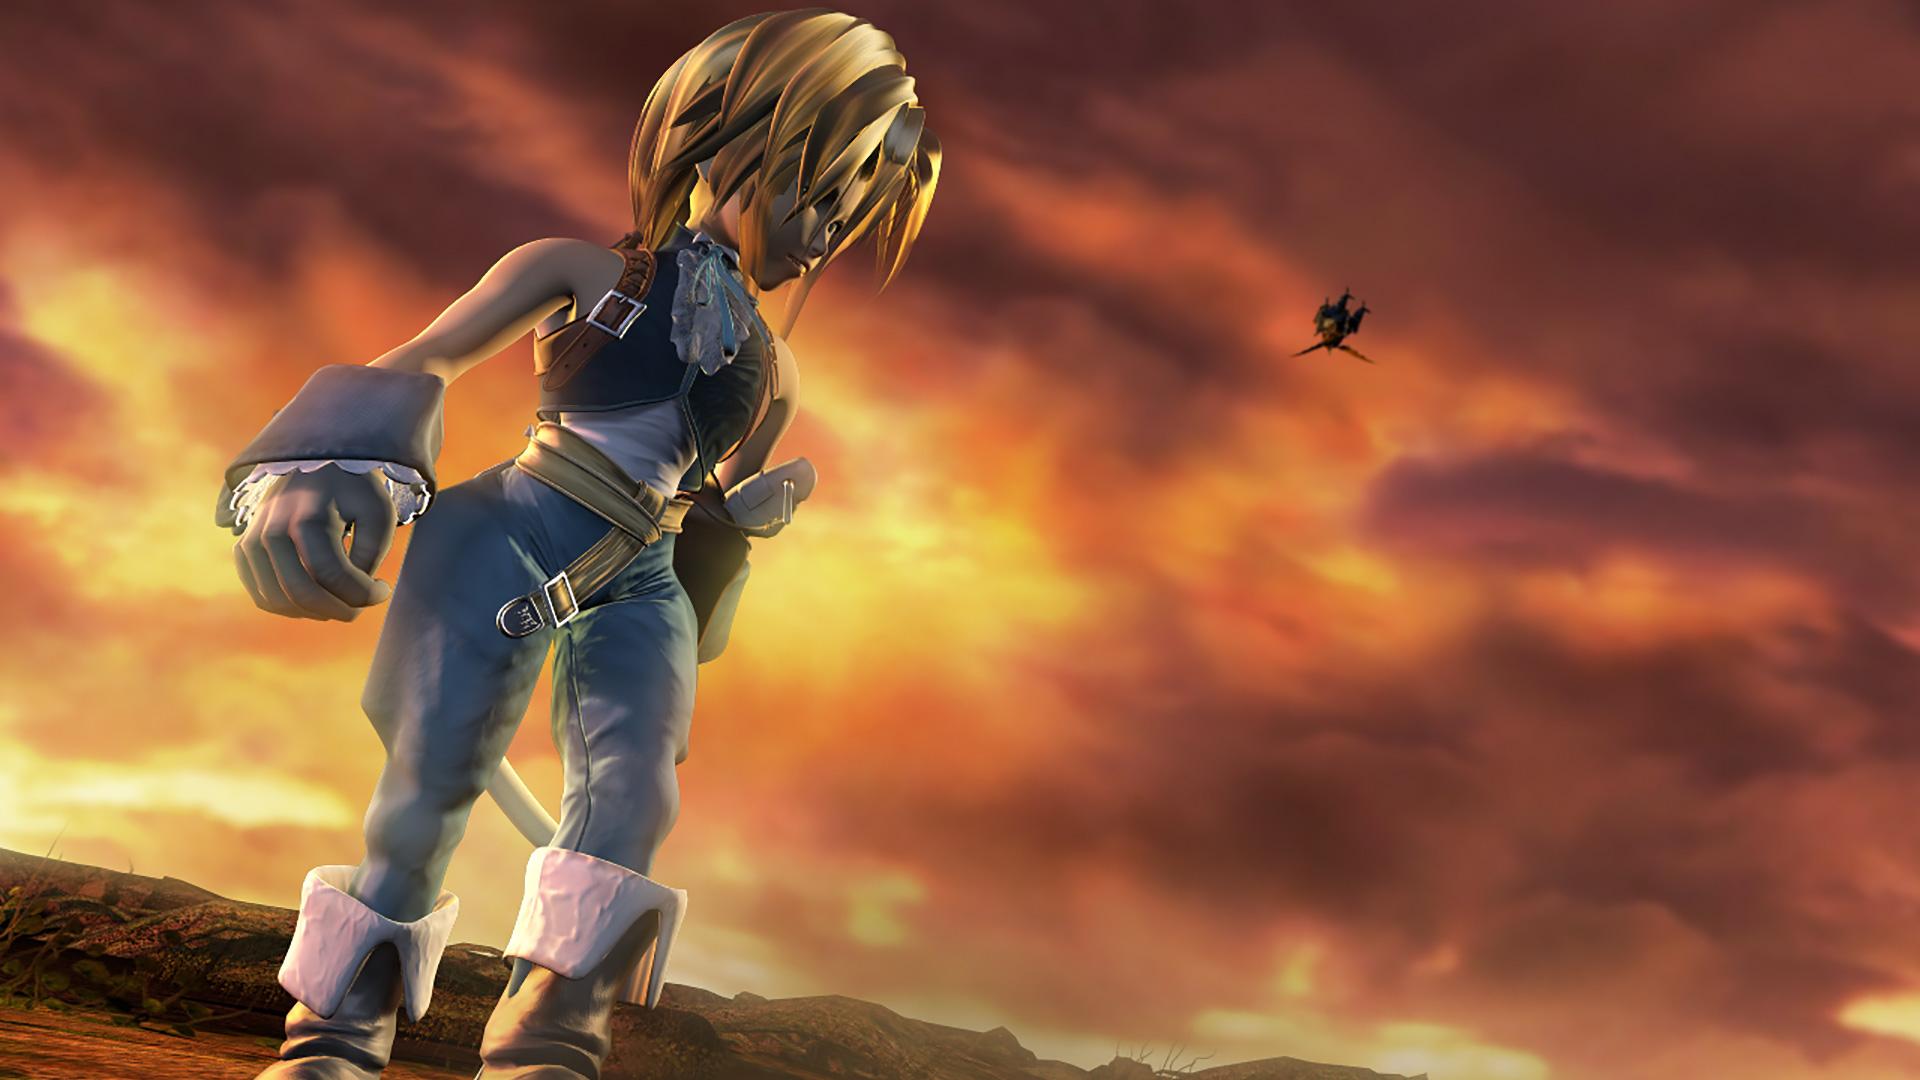 Recensione di Final Fantasy IX per Steam!